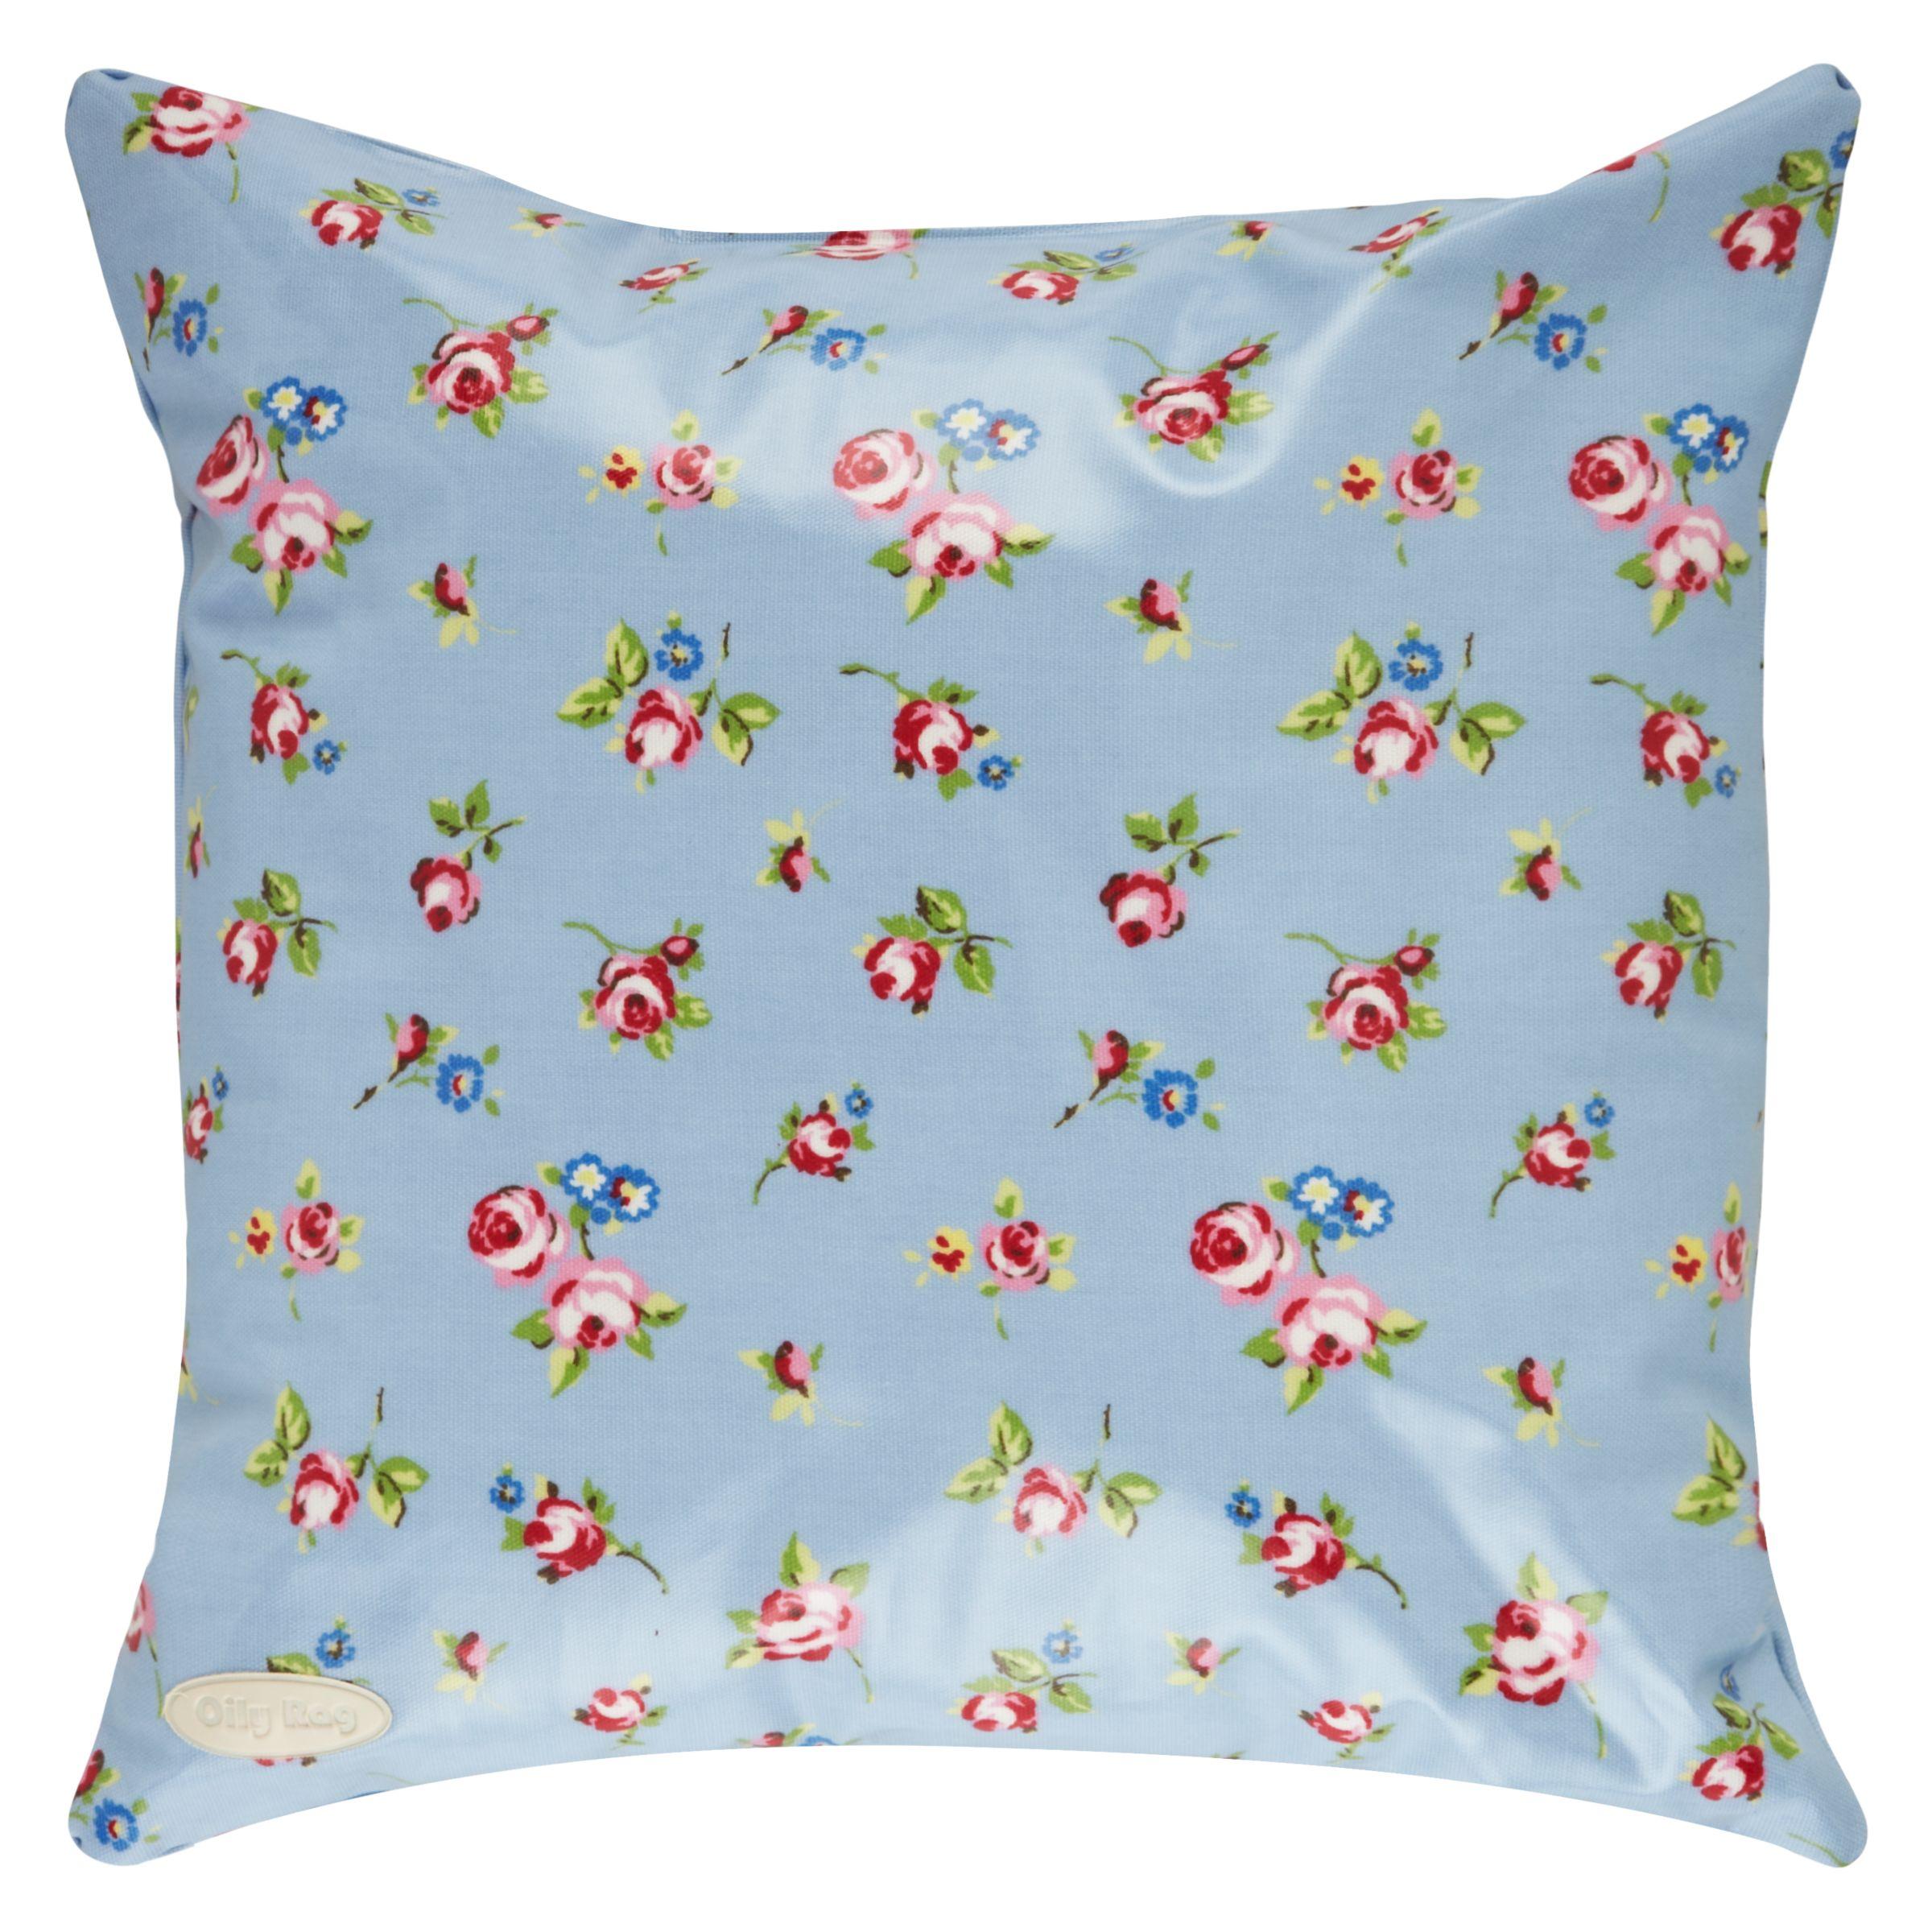 Oily Rag Rosebud Outdoor Cushion, 40 x 40cm